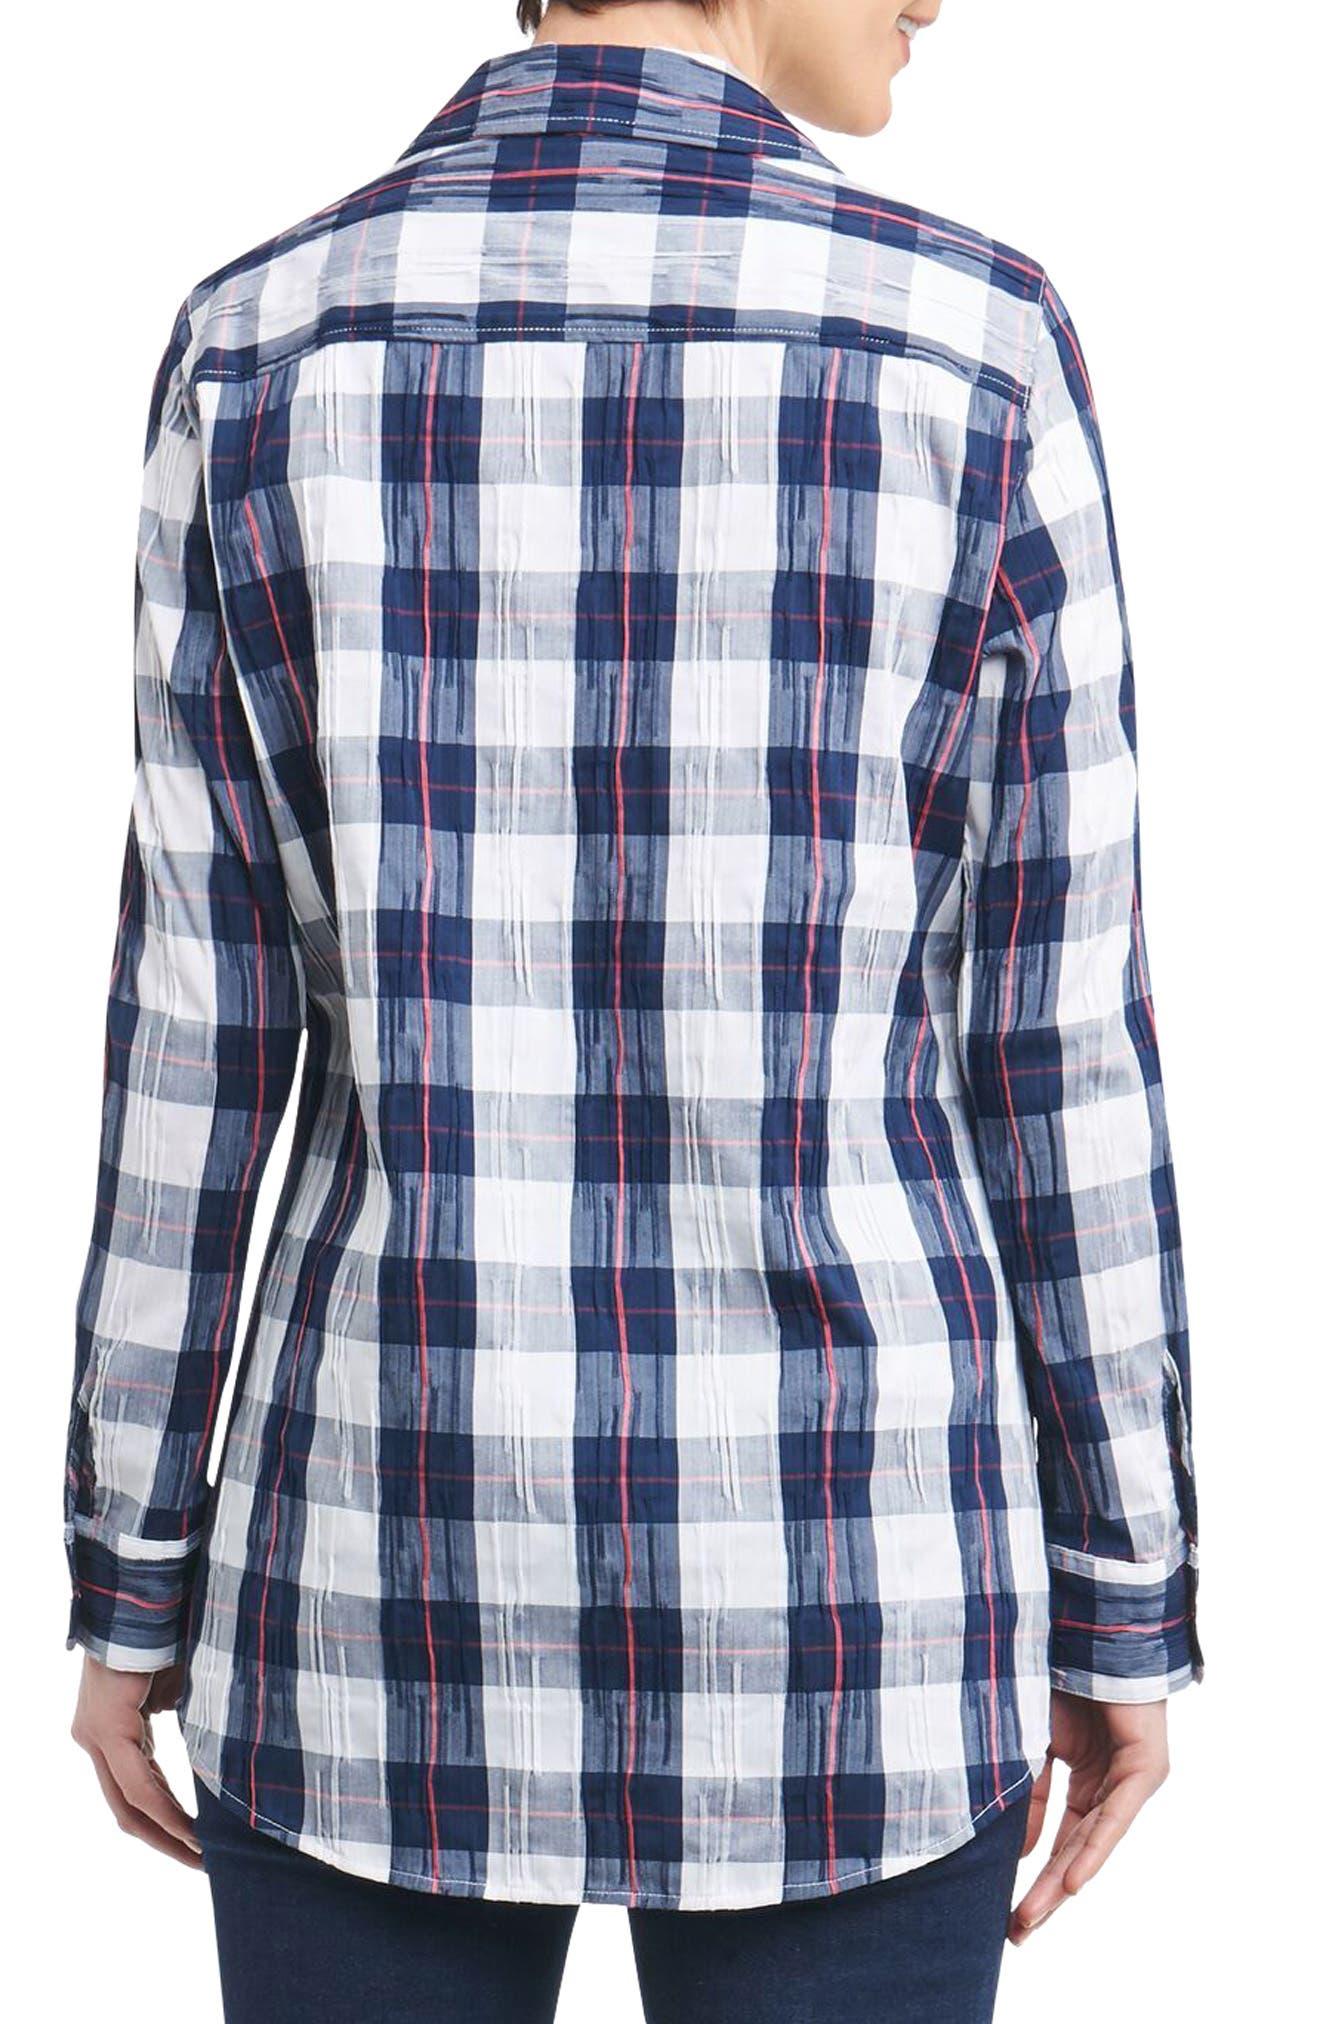 Fay Crinkle Plaid Stretch Cotton Blend Tunic Shirt,                             Alternate thumbnail 4, color,